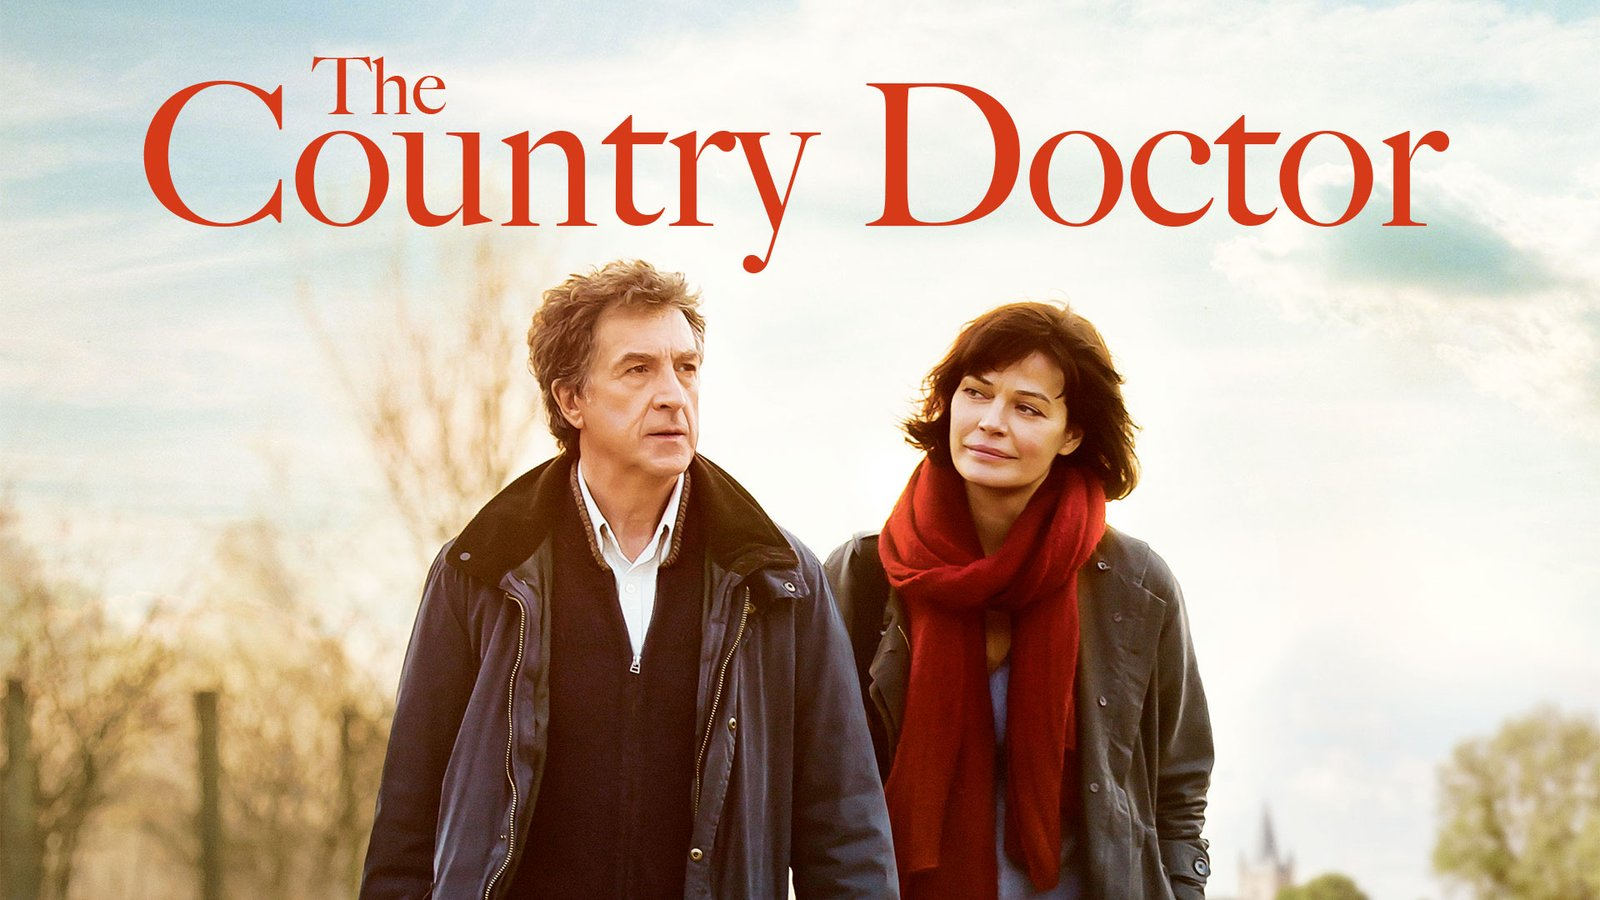 The Country Doctor - Médecin de campagne